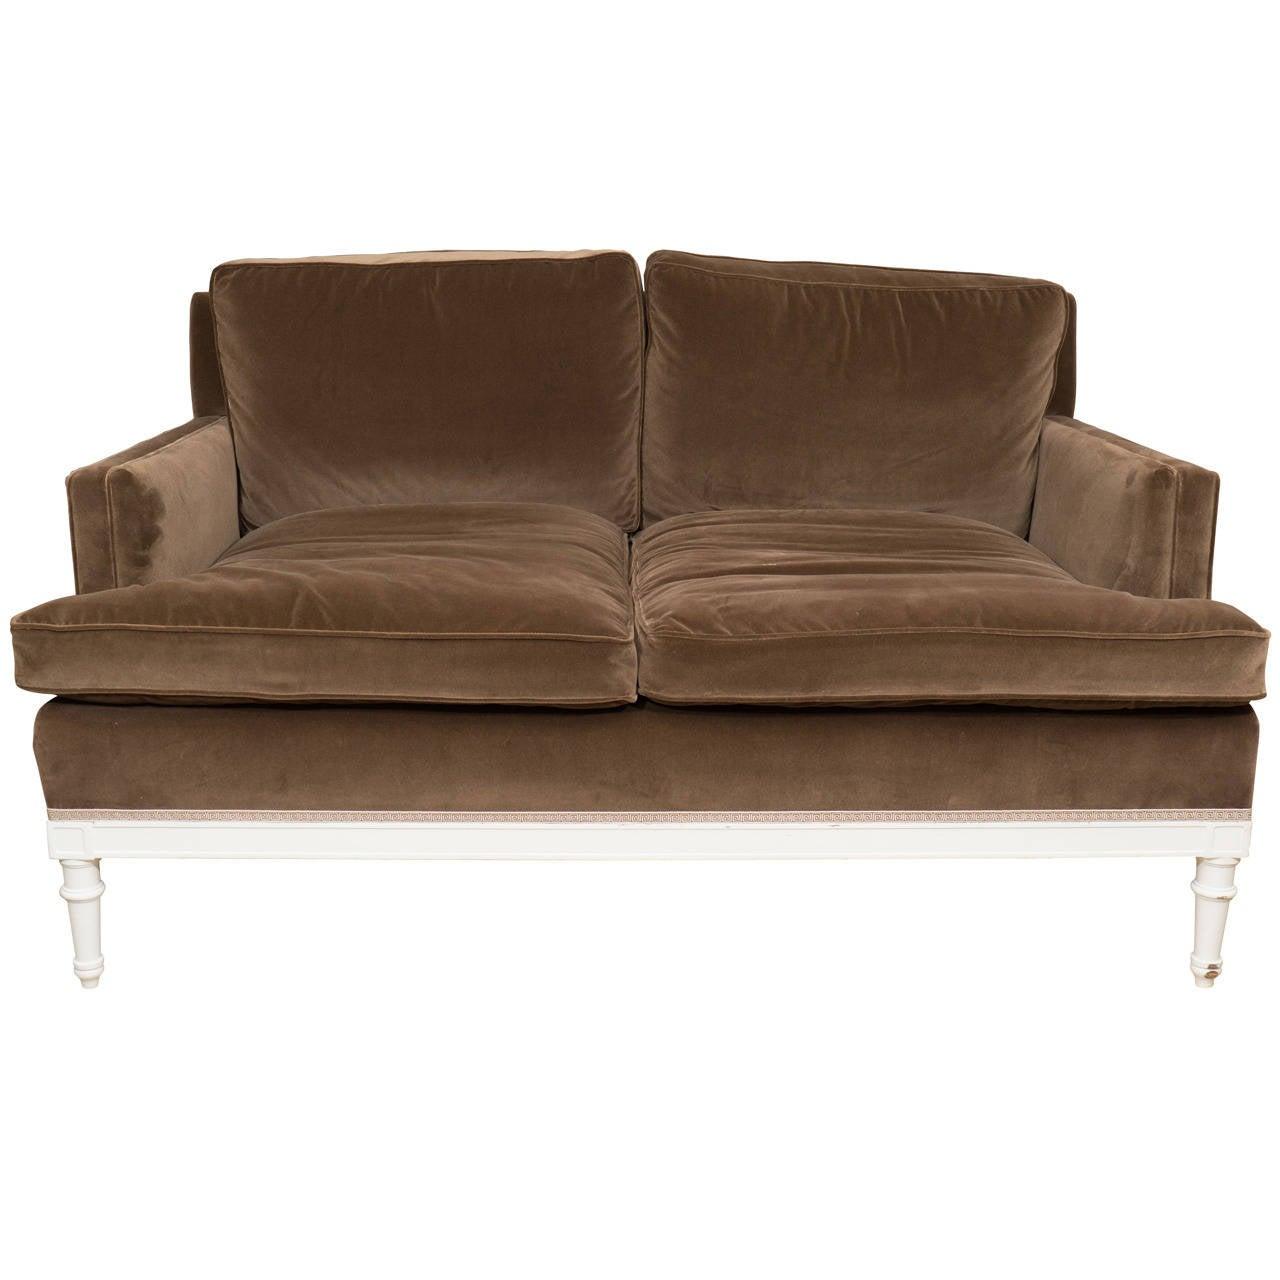 Jansen Style Loveseat Upholstered In Chocolate Brown Cotton Velvet At 1stdibs